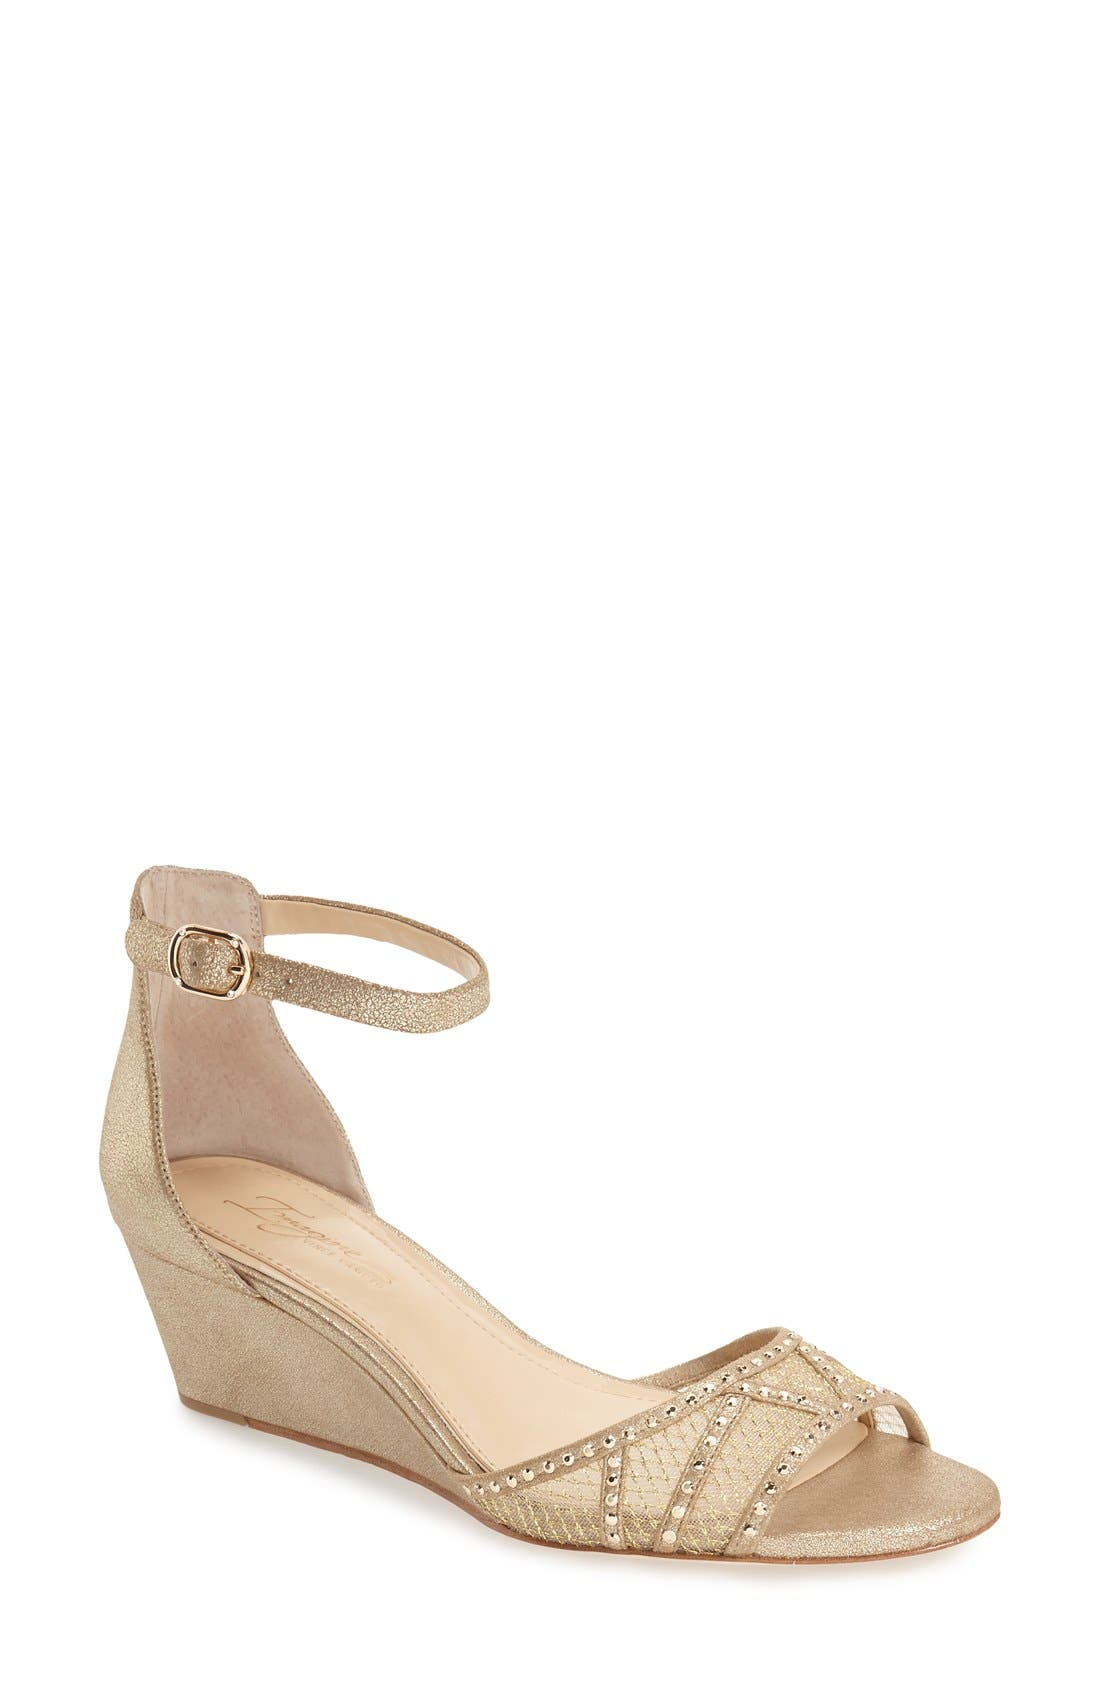 'Joan' Studded Wedge Sandal,                             Main thumbnail 2, color,